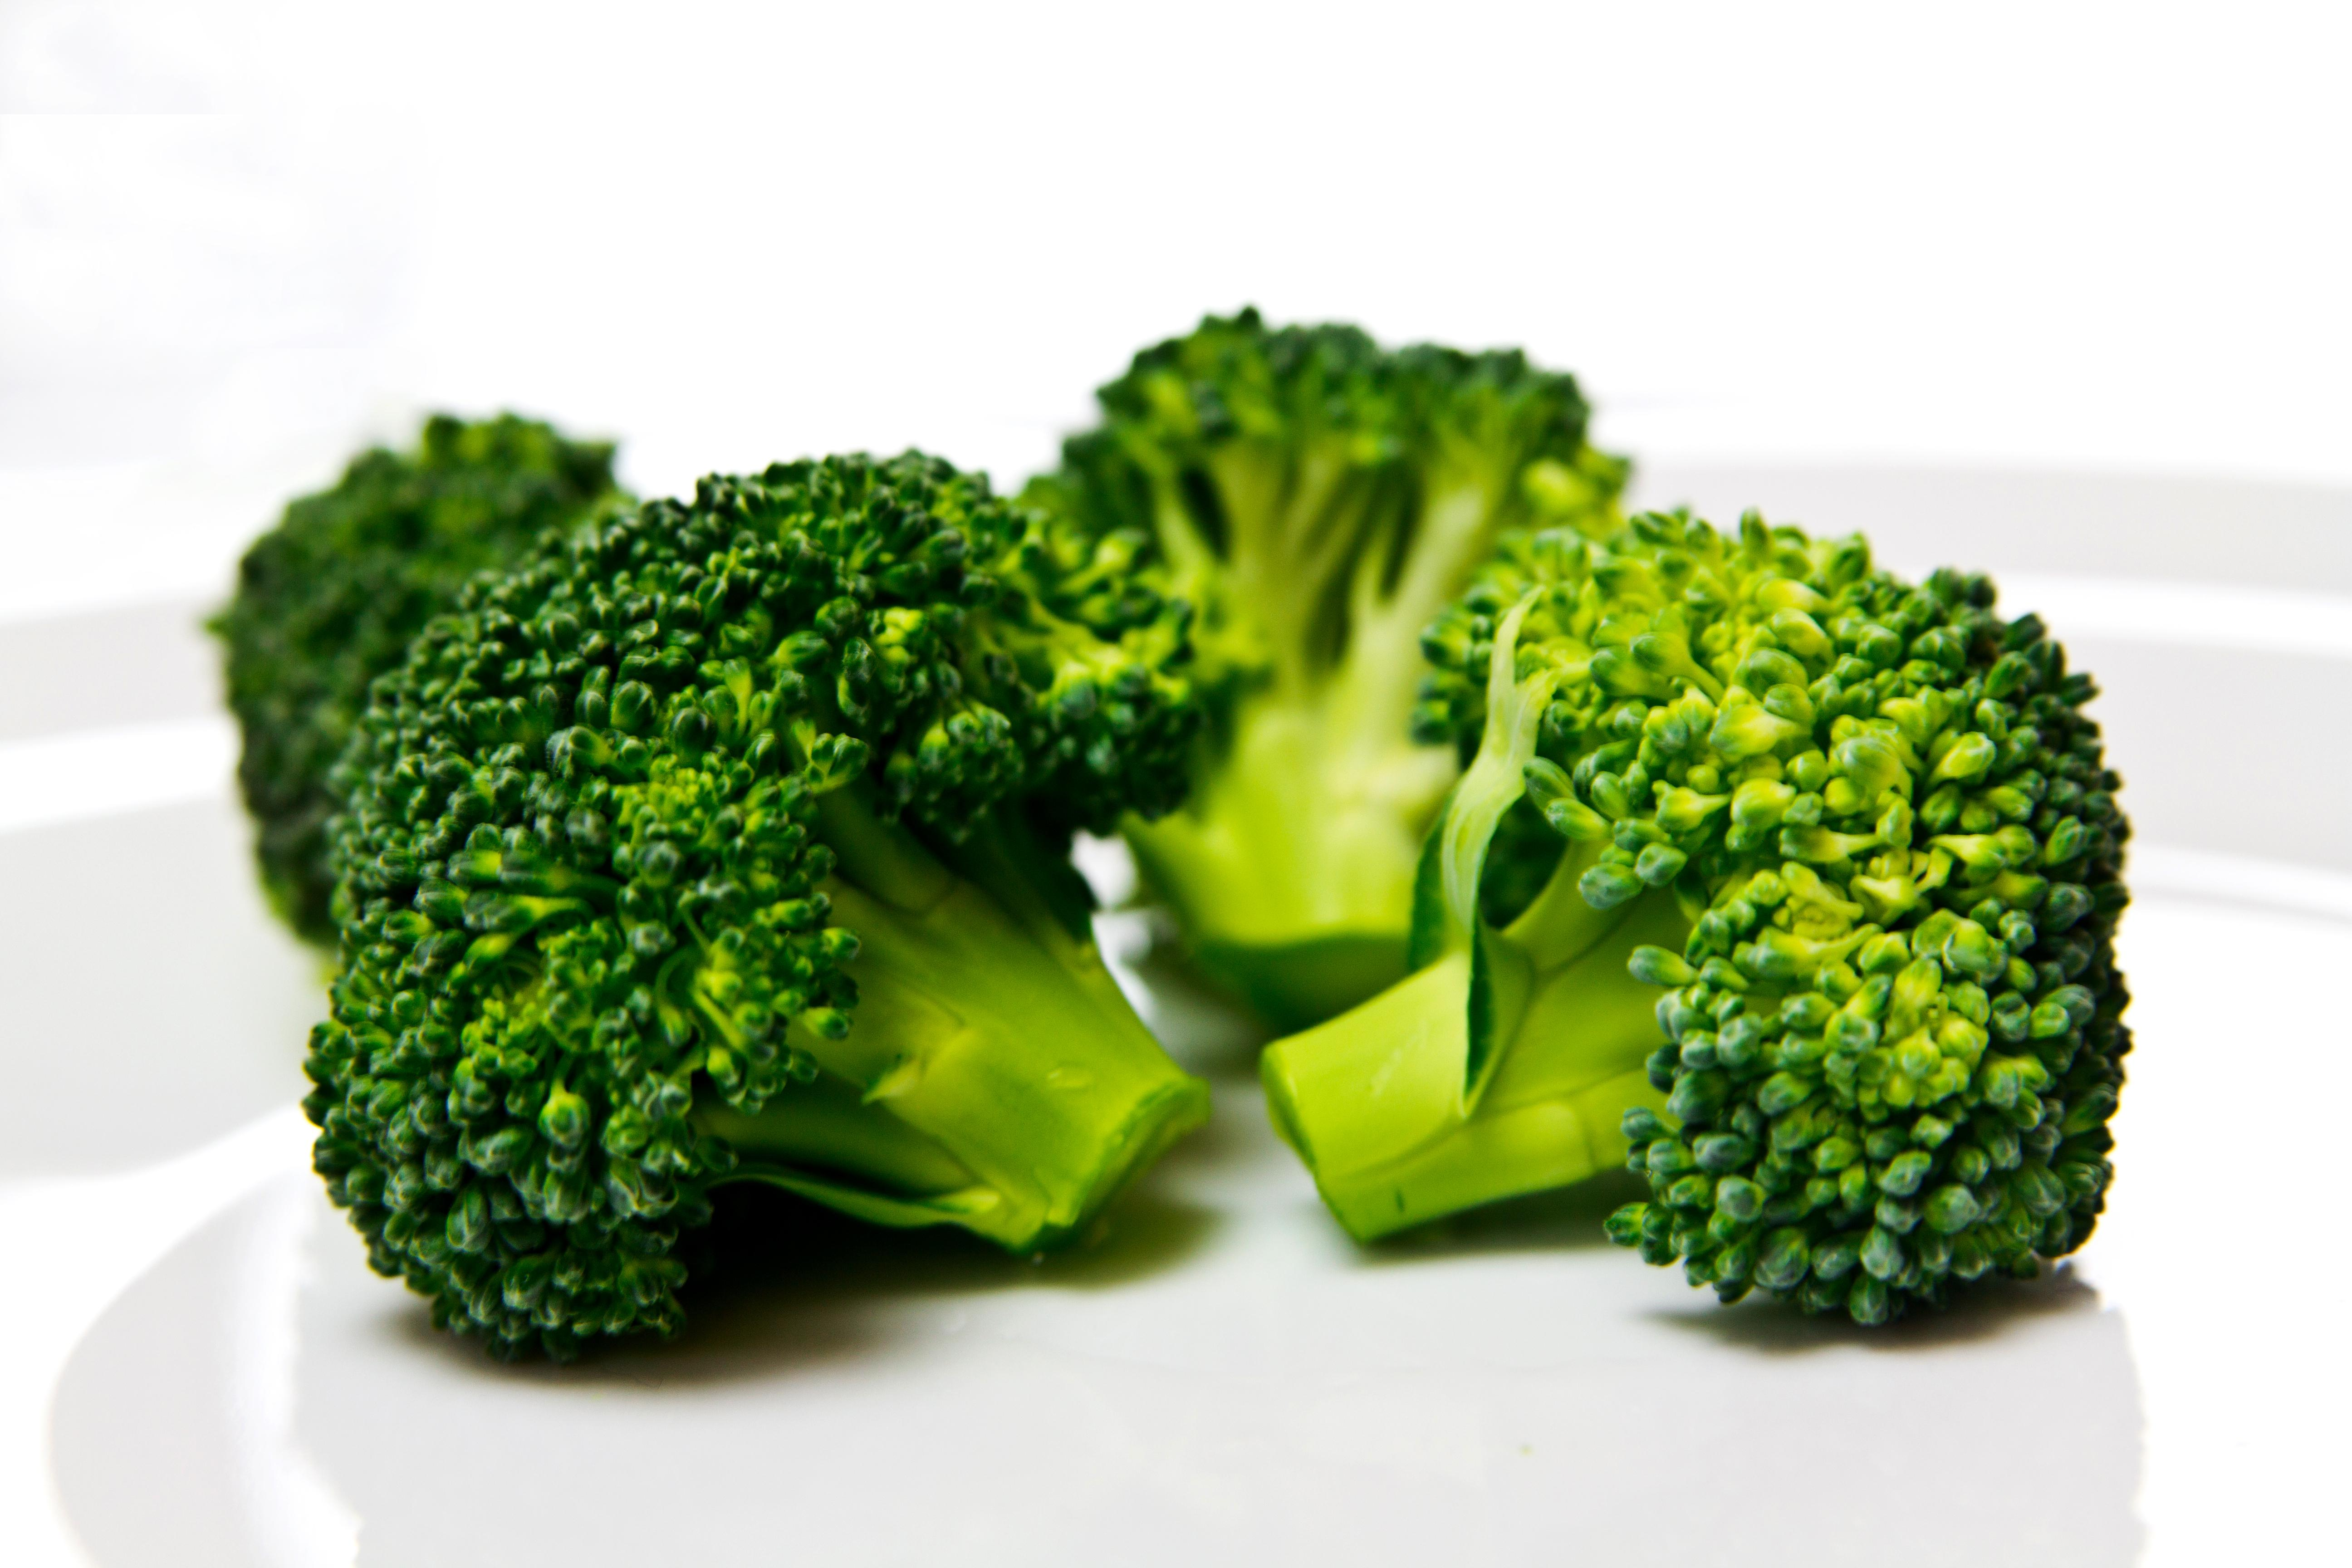 fresh brokkoli florets on white plate